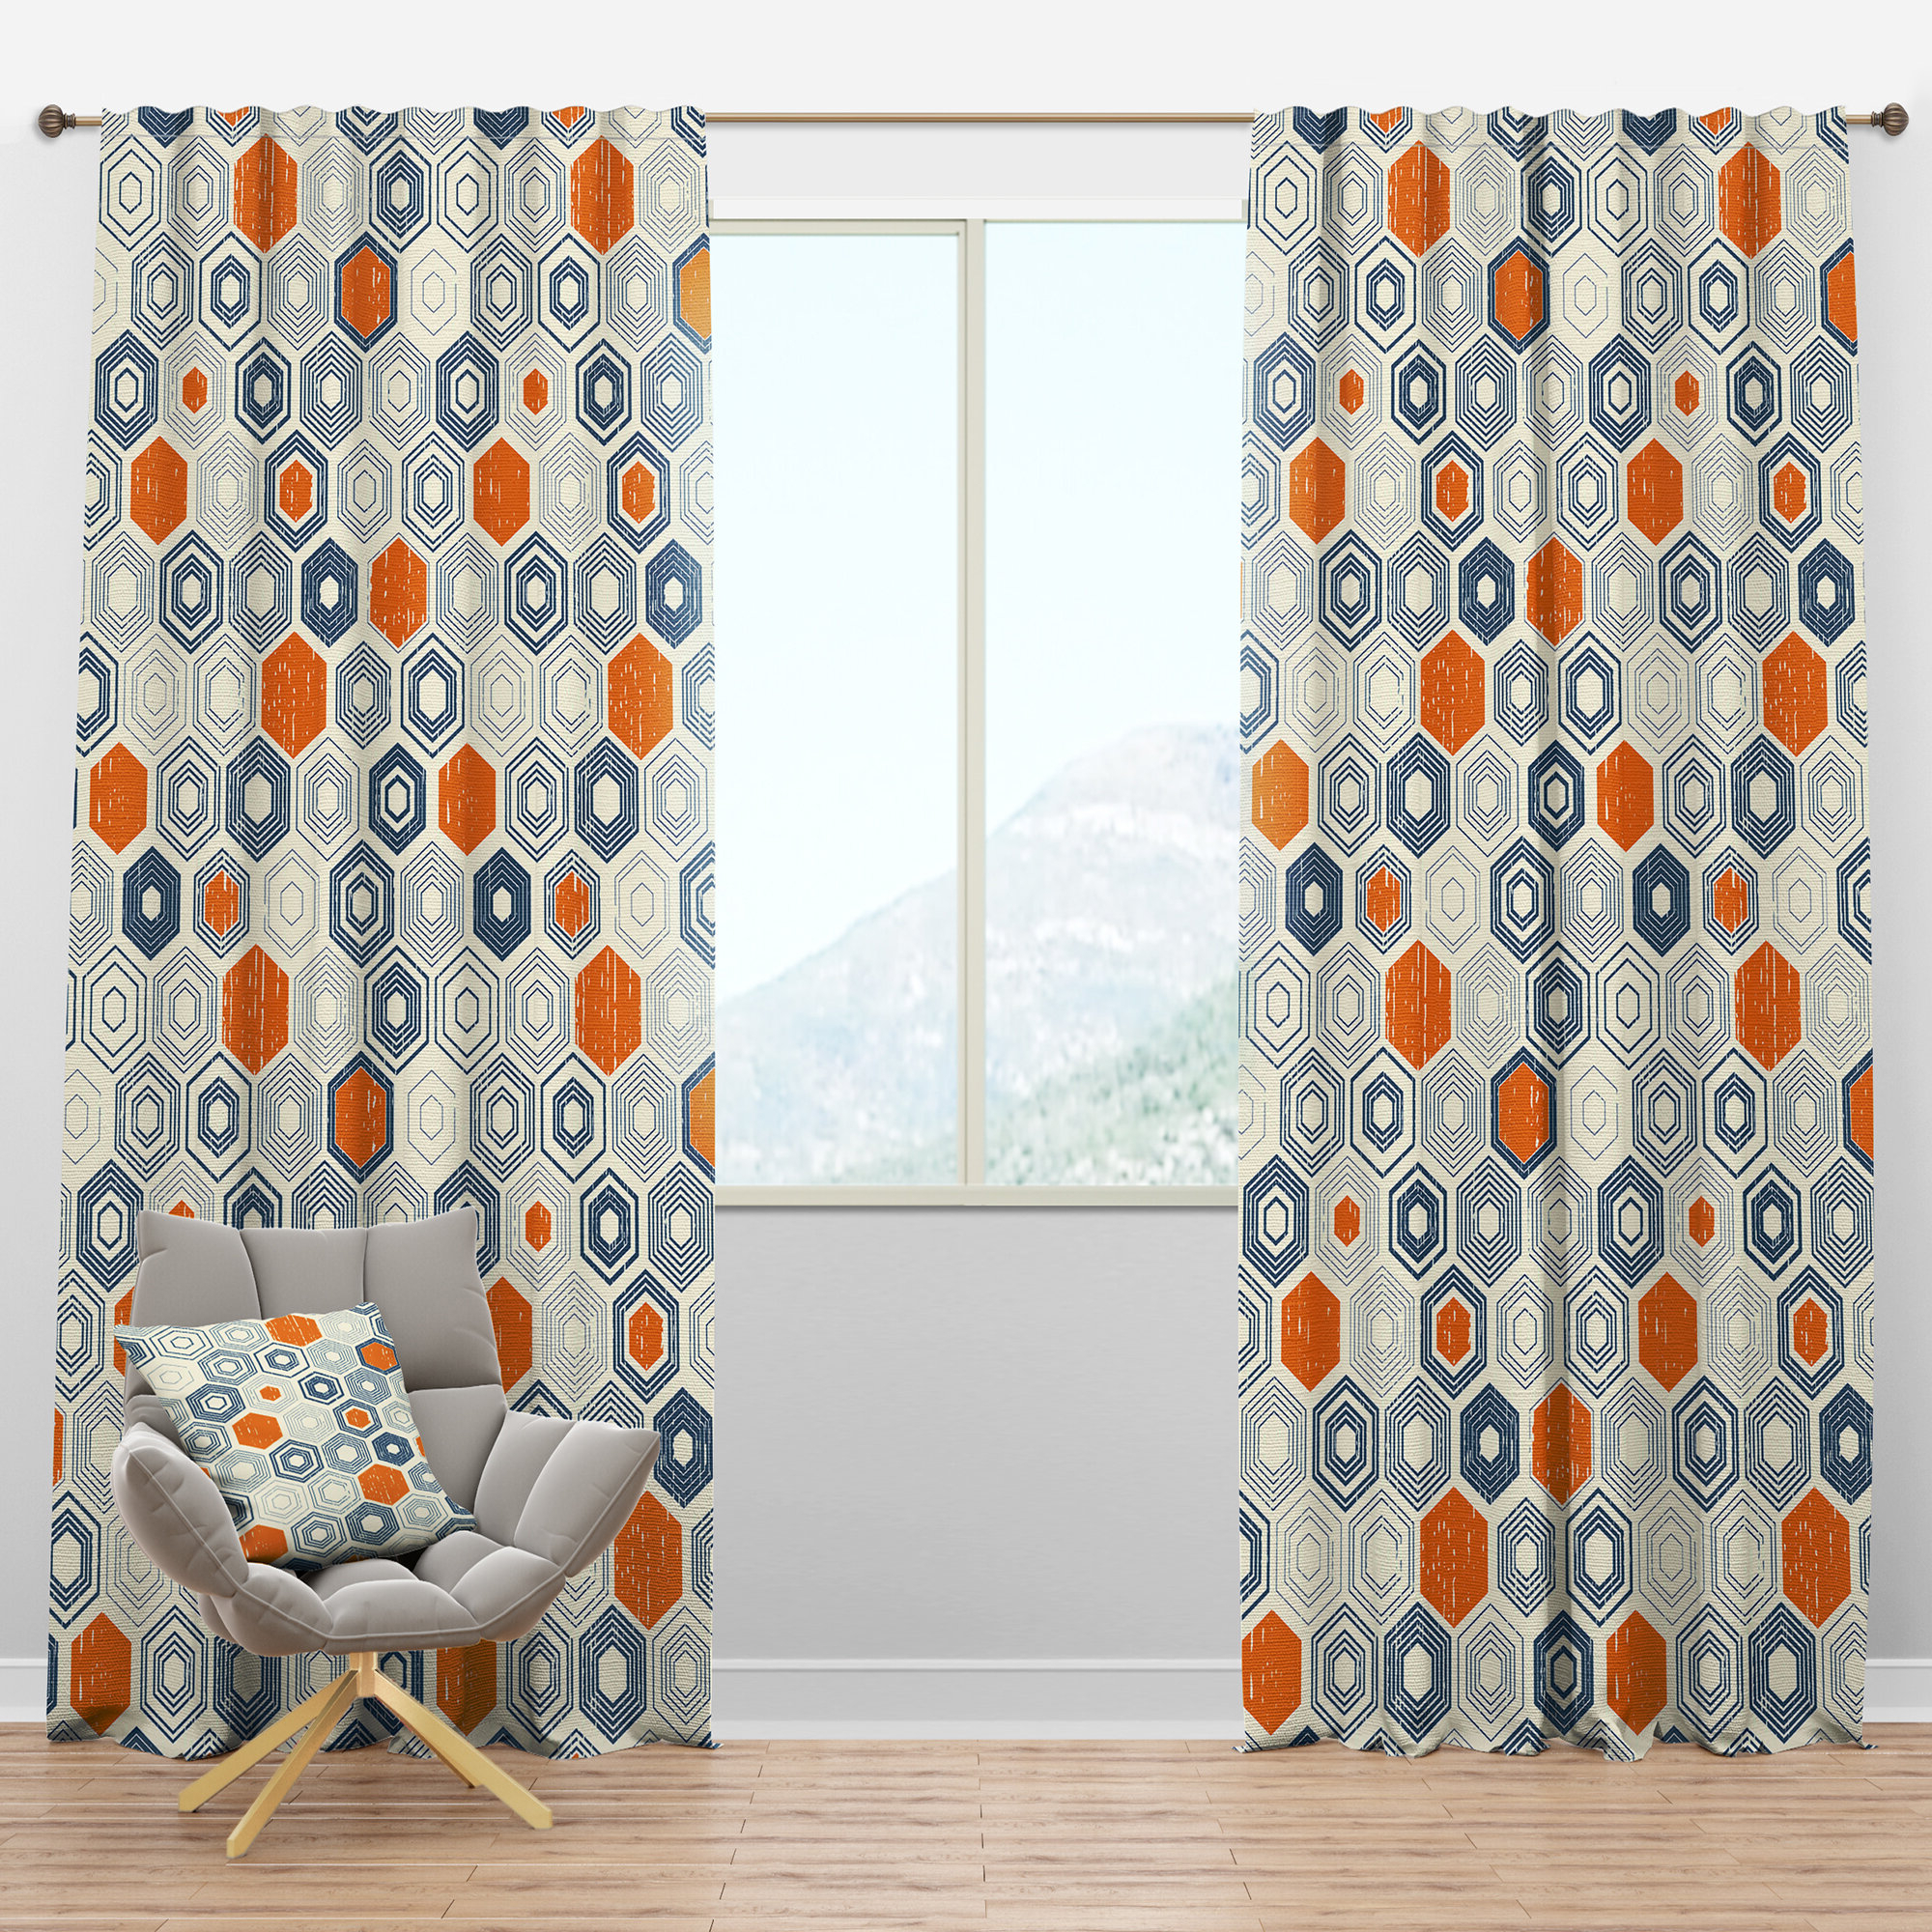 Widely Used Mid Century Geo Room Darkening Window Curtain Panel Pairs With Mid Century Hexagon Ix Geometric Semi Sheer Thermal Rod Pocket Curtain Panels (View 18 of 22)